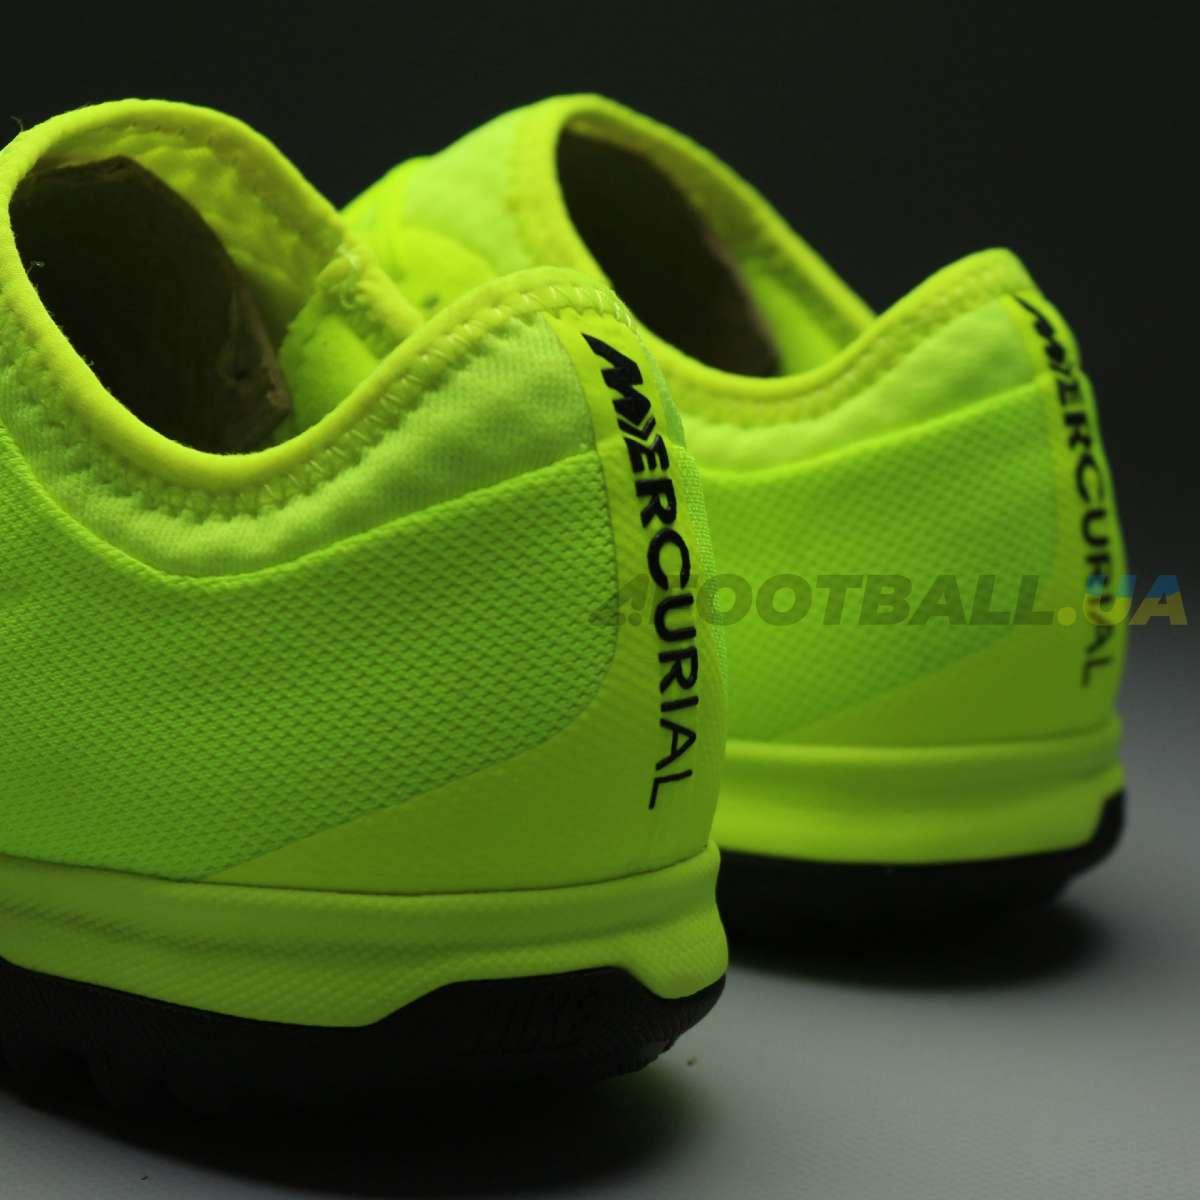 ... Сороконожки Nike Mercurial Vapor 12 Pro AH7388-701 5 9ba7bd0f58db0